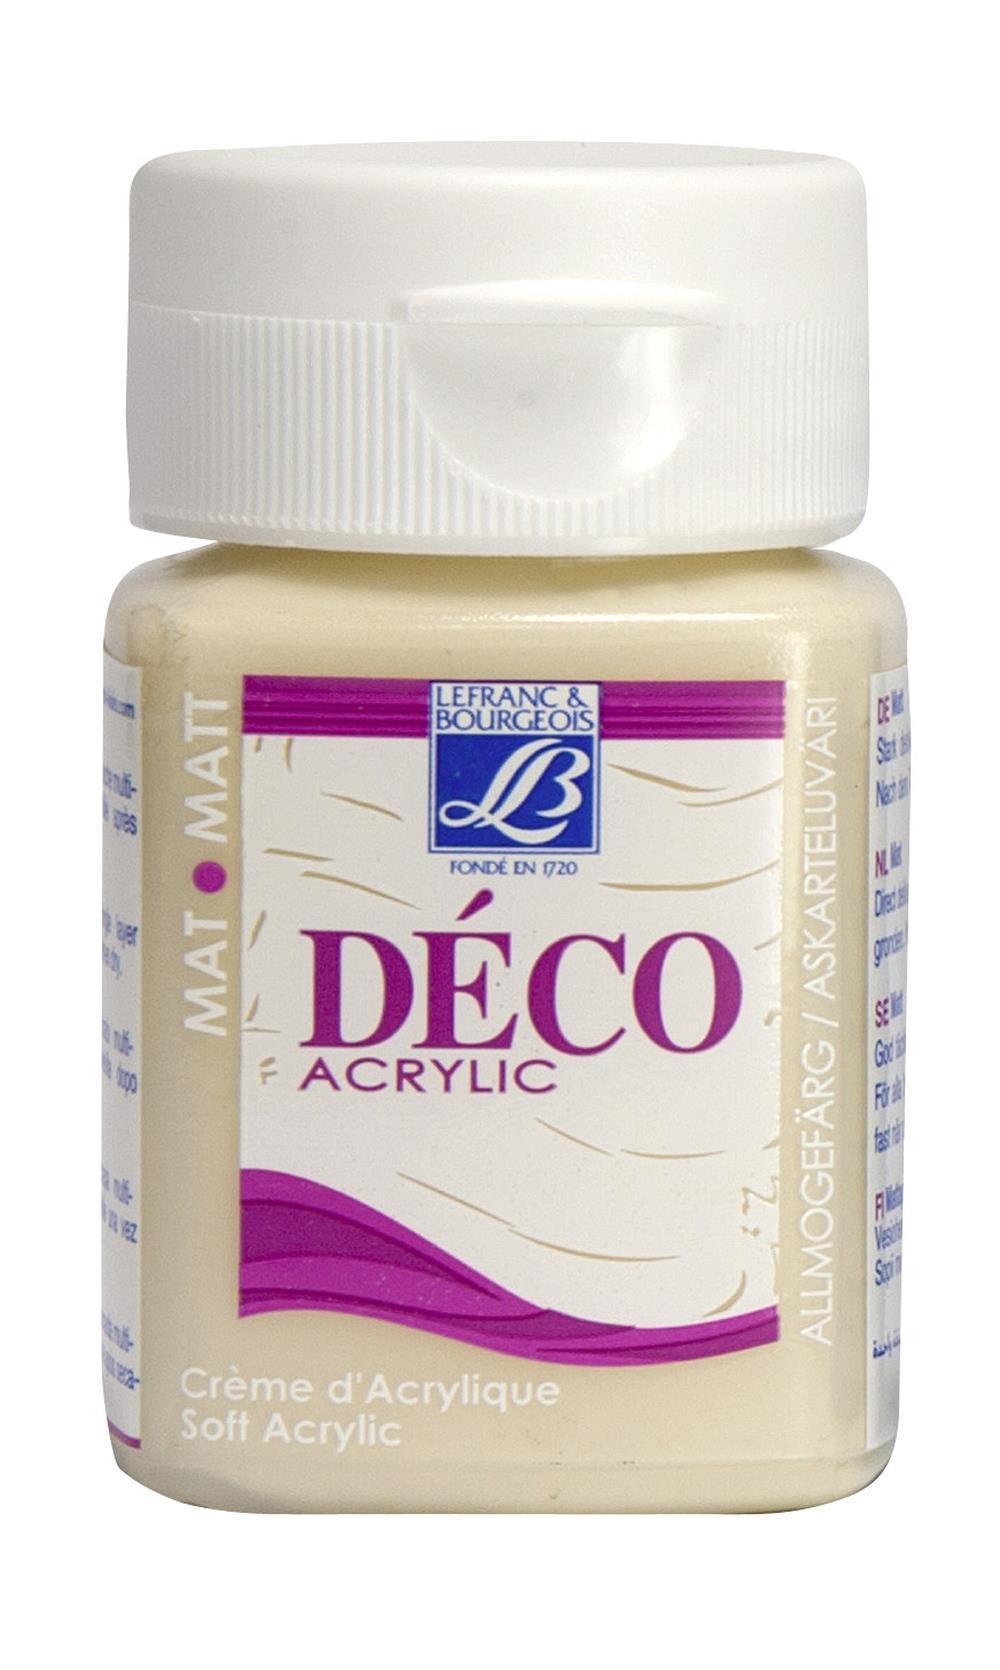 Hobbyfärg L&B Deco Matt Akryl 50ml Cafe cream warm 872 (4F)